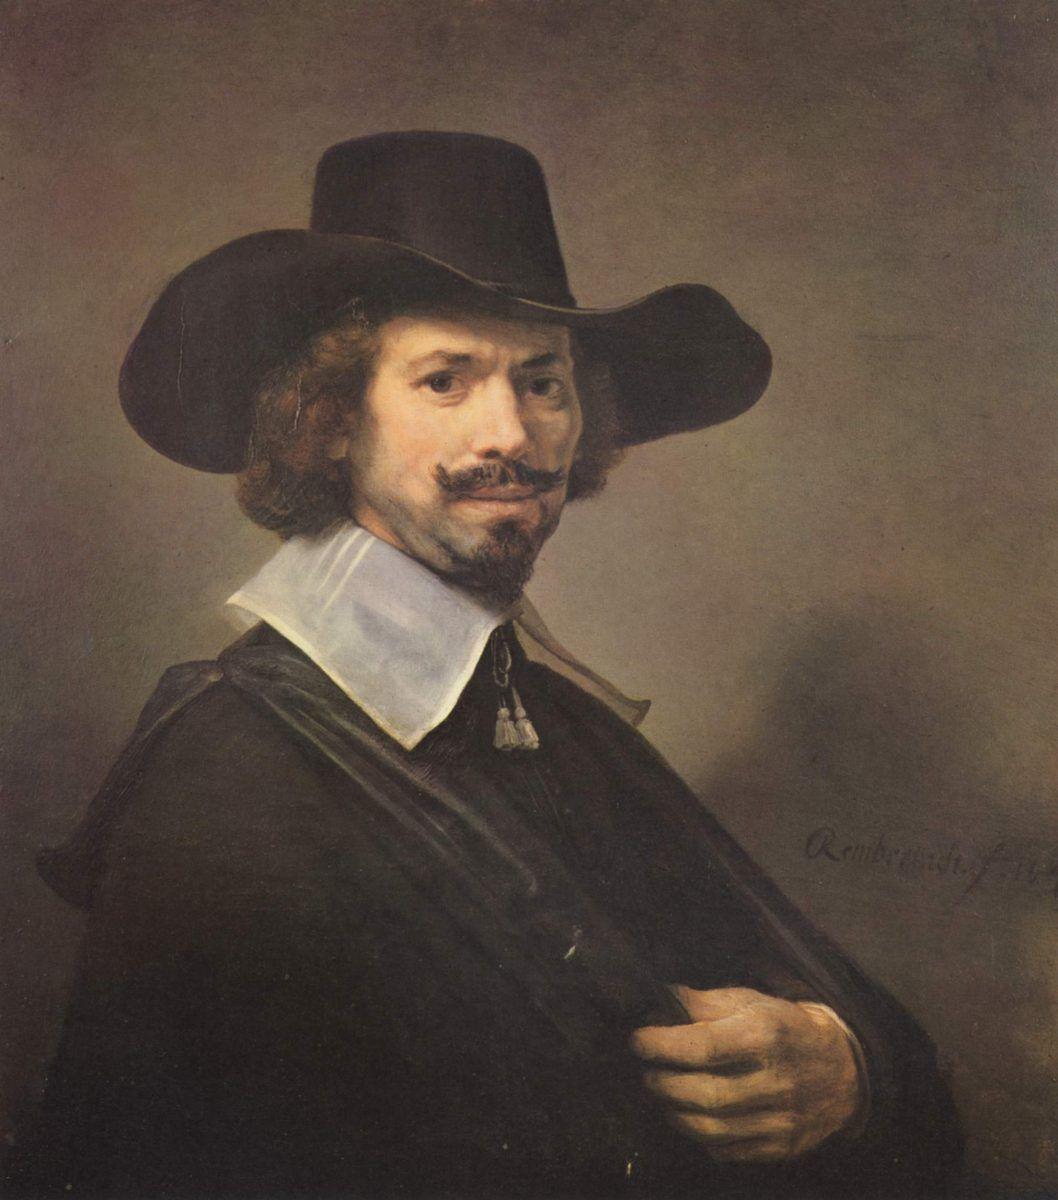 Cuadros de Rembrandt Harmenszoon van Rijn